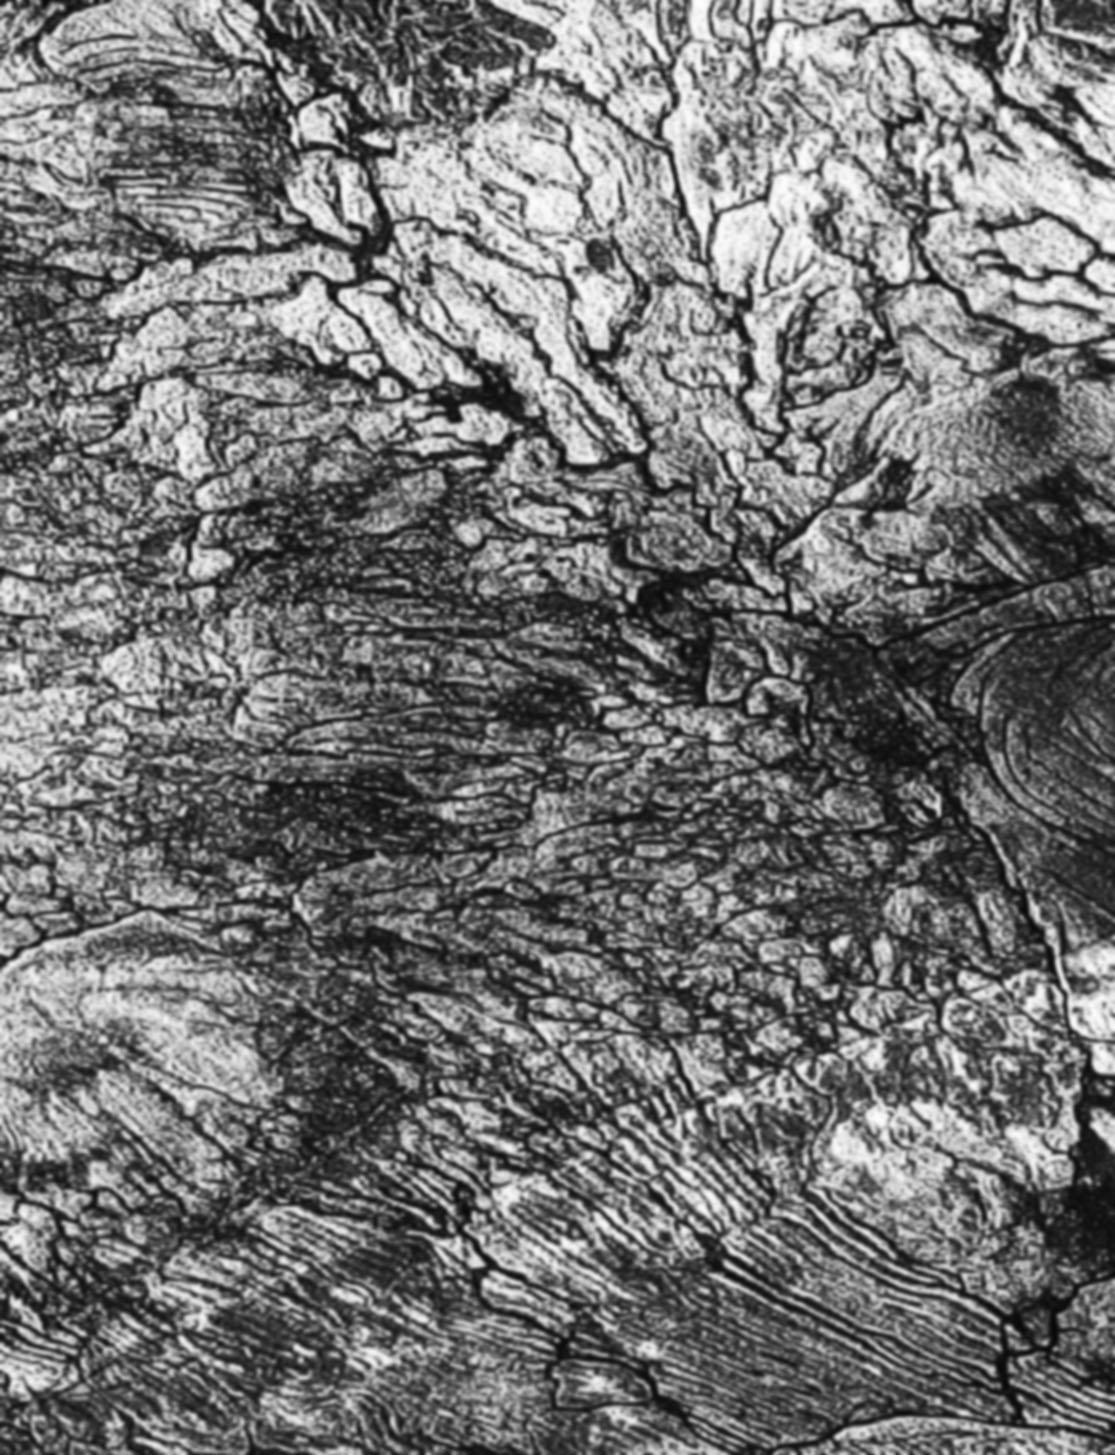 Shaun Fraser - Untitled, Screen print 01.png